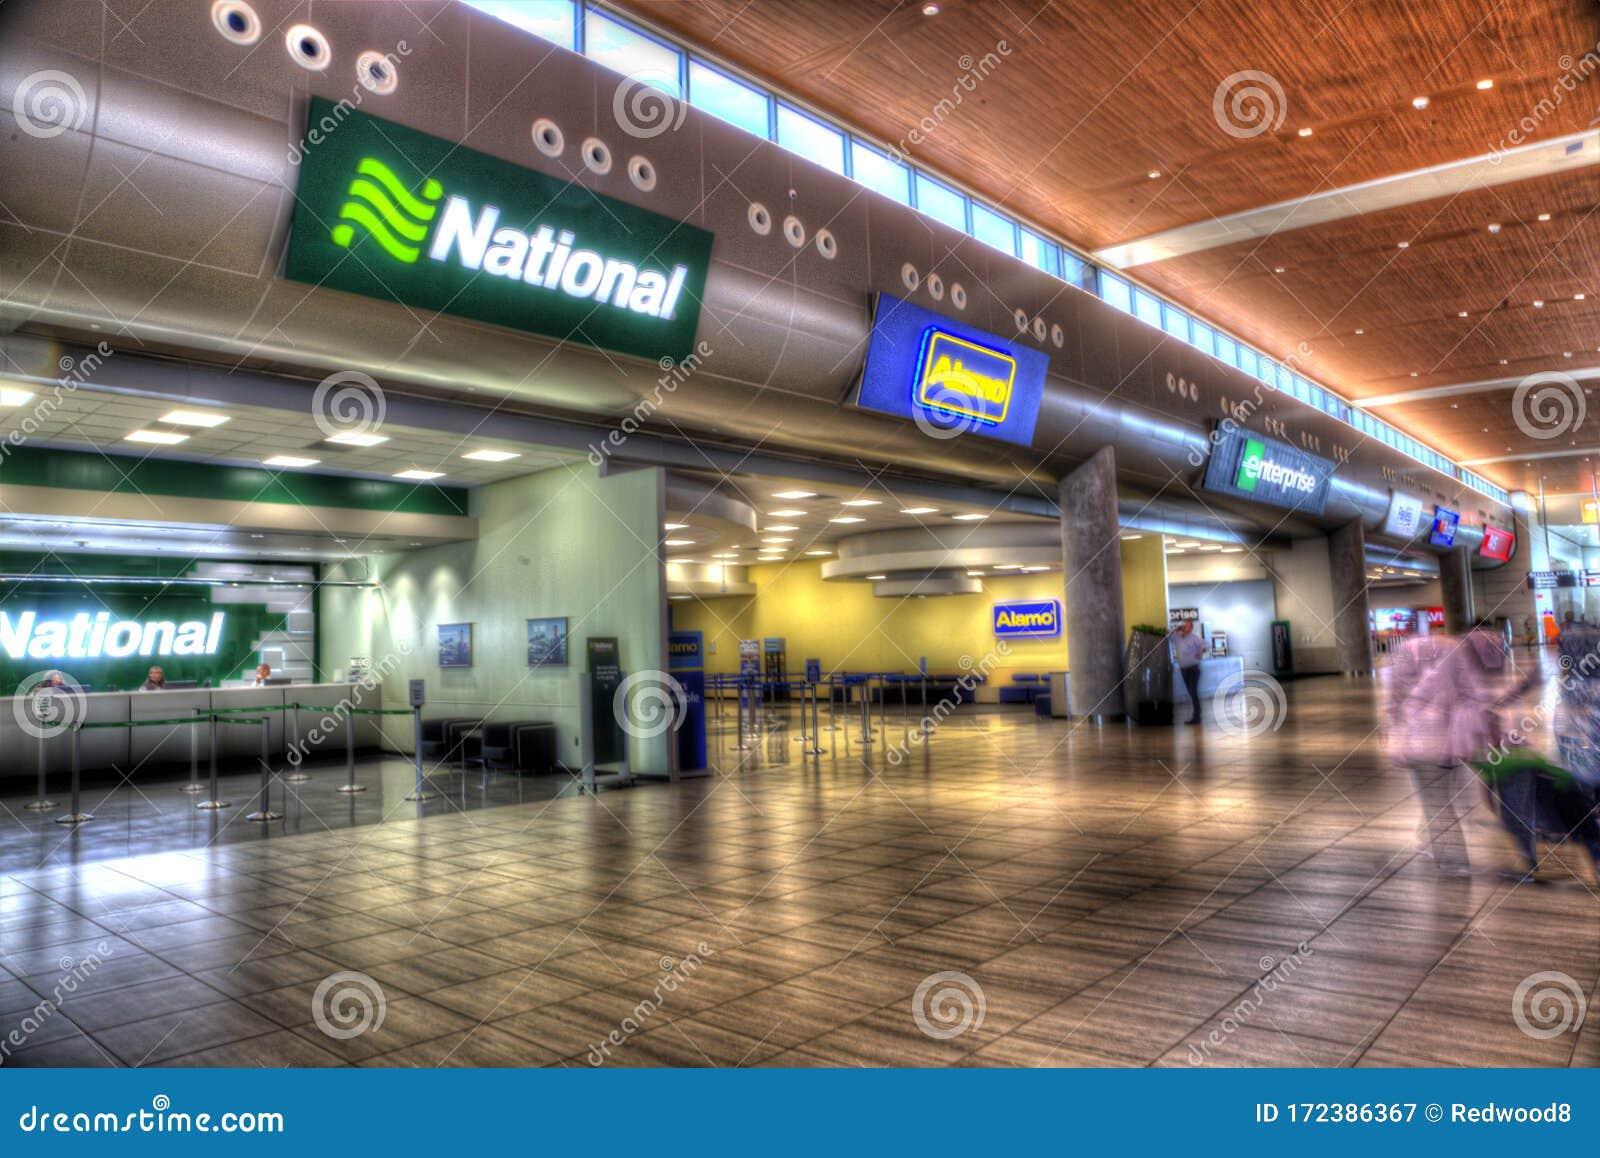 tampa airport car rental companies - carports garages